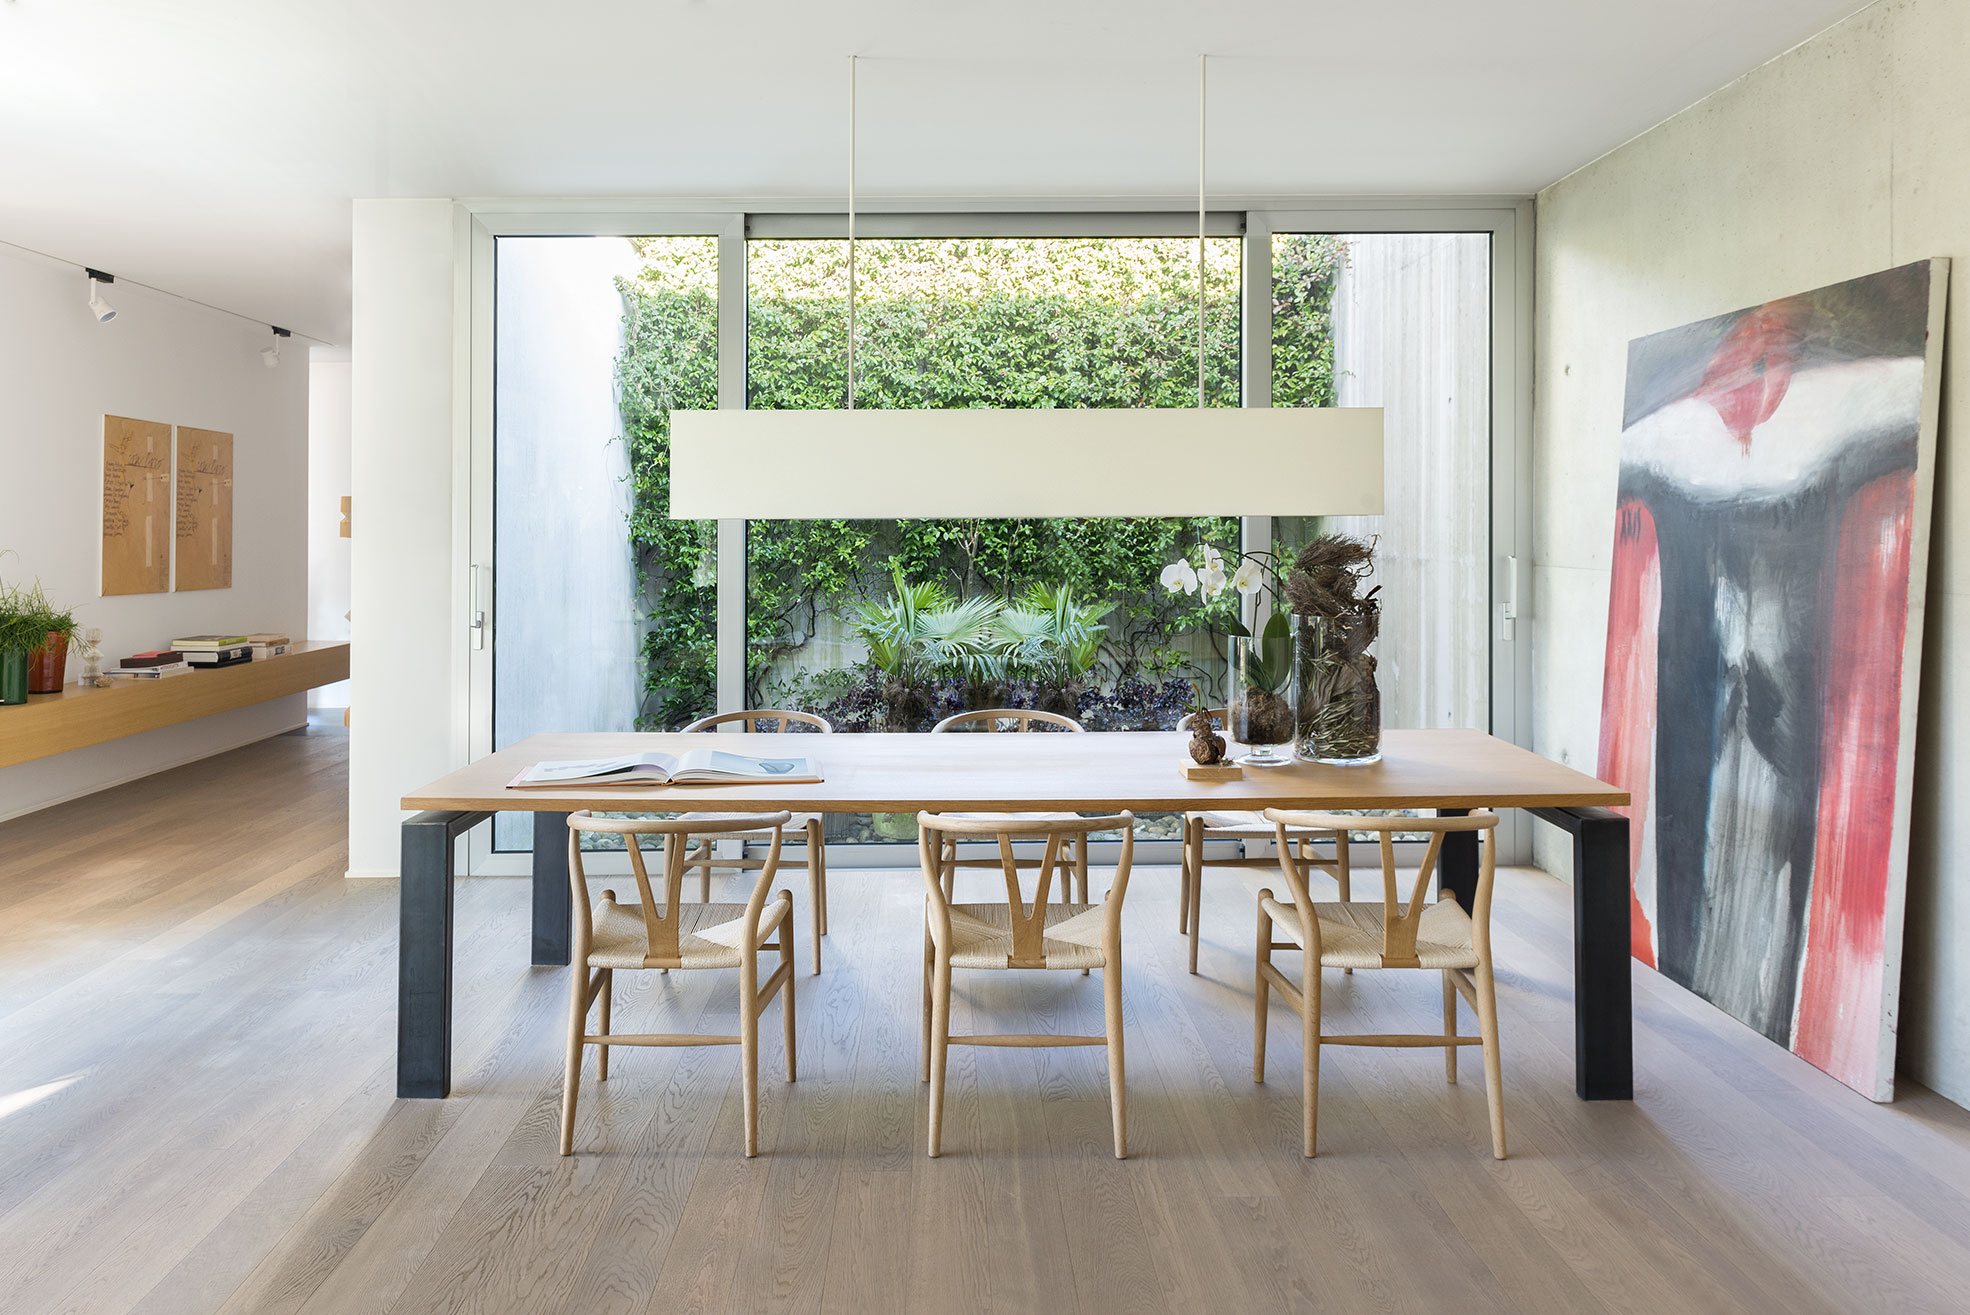 Wooden table in the living room of the concrete and minimalist villa of Rosalba Piccinni Photographer Maria Teresa Furnari